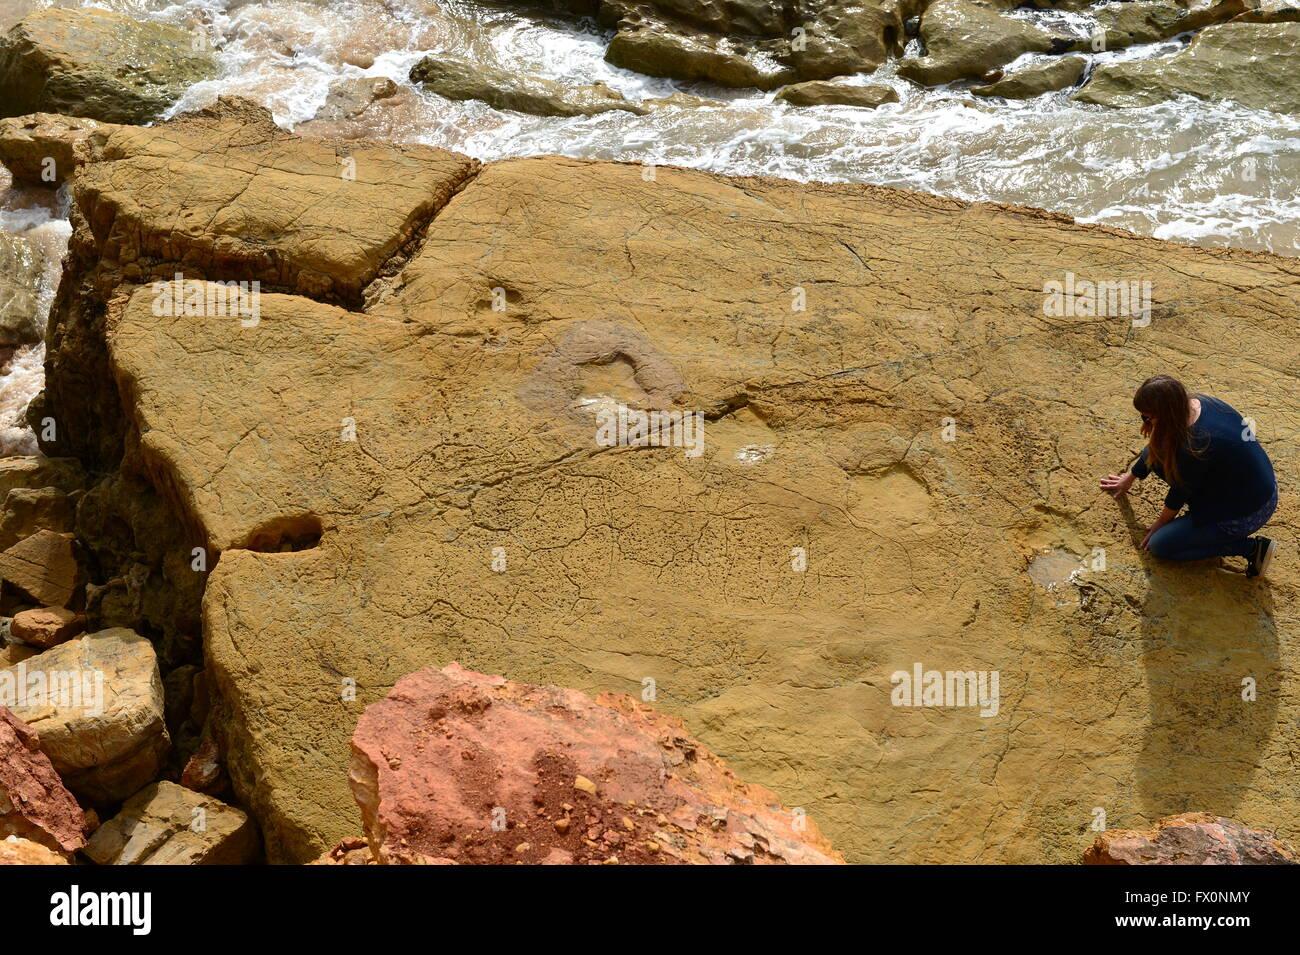 Dinosaur footprints of herbivorous biped or Ornithopod three-toed tridactyl, at Salema on the Algarve Portugal Stock Photo